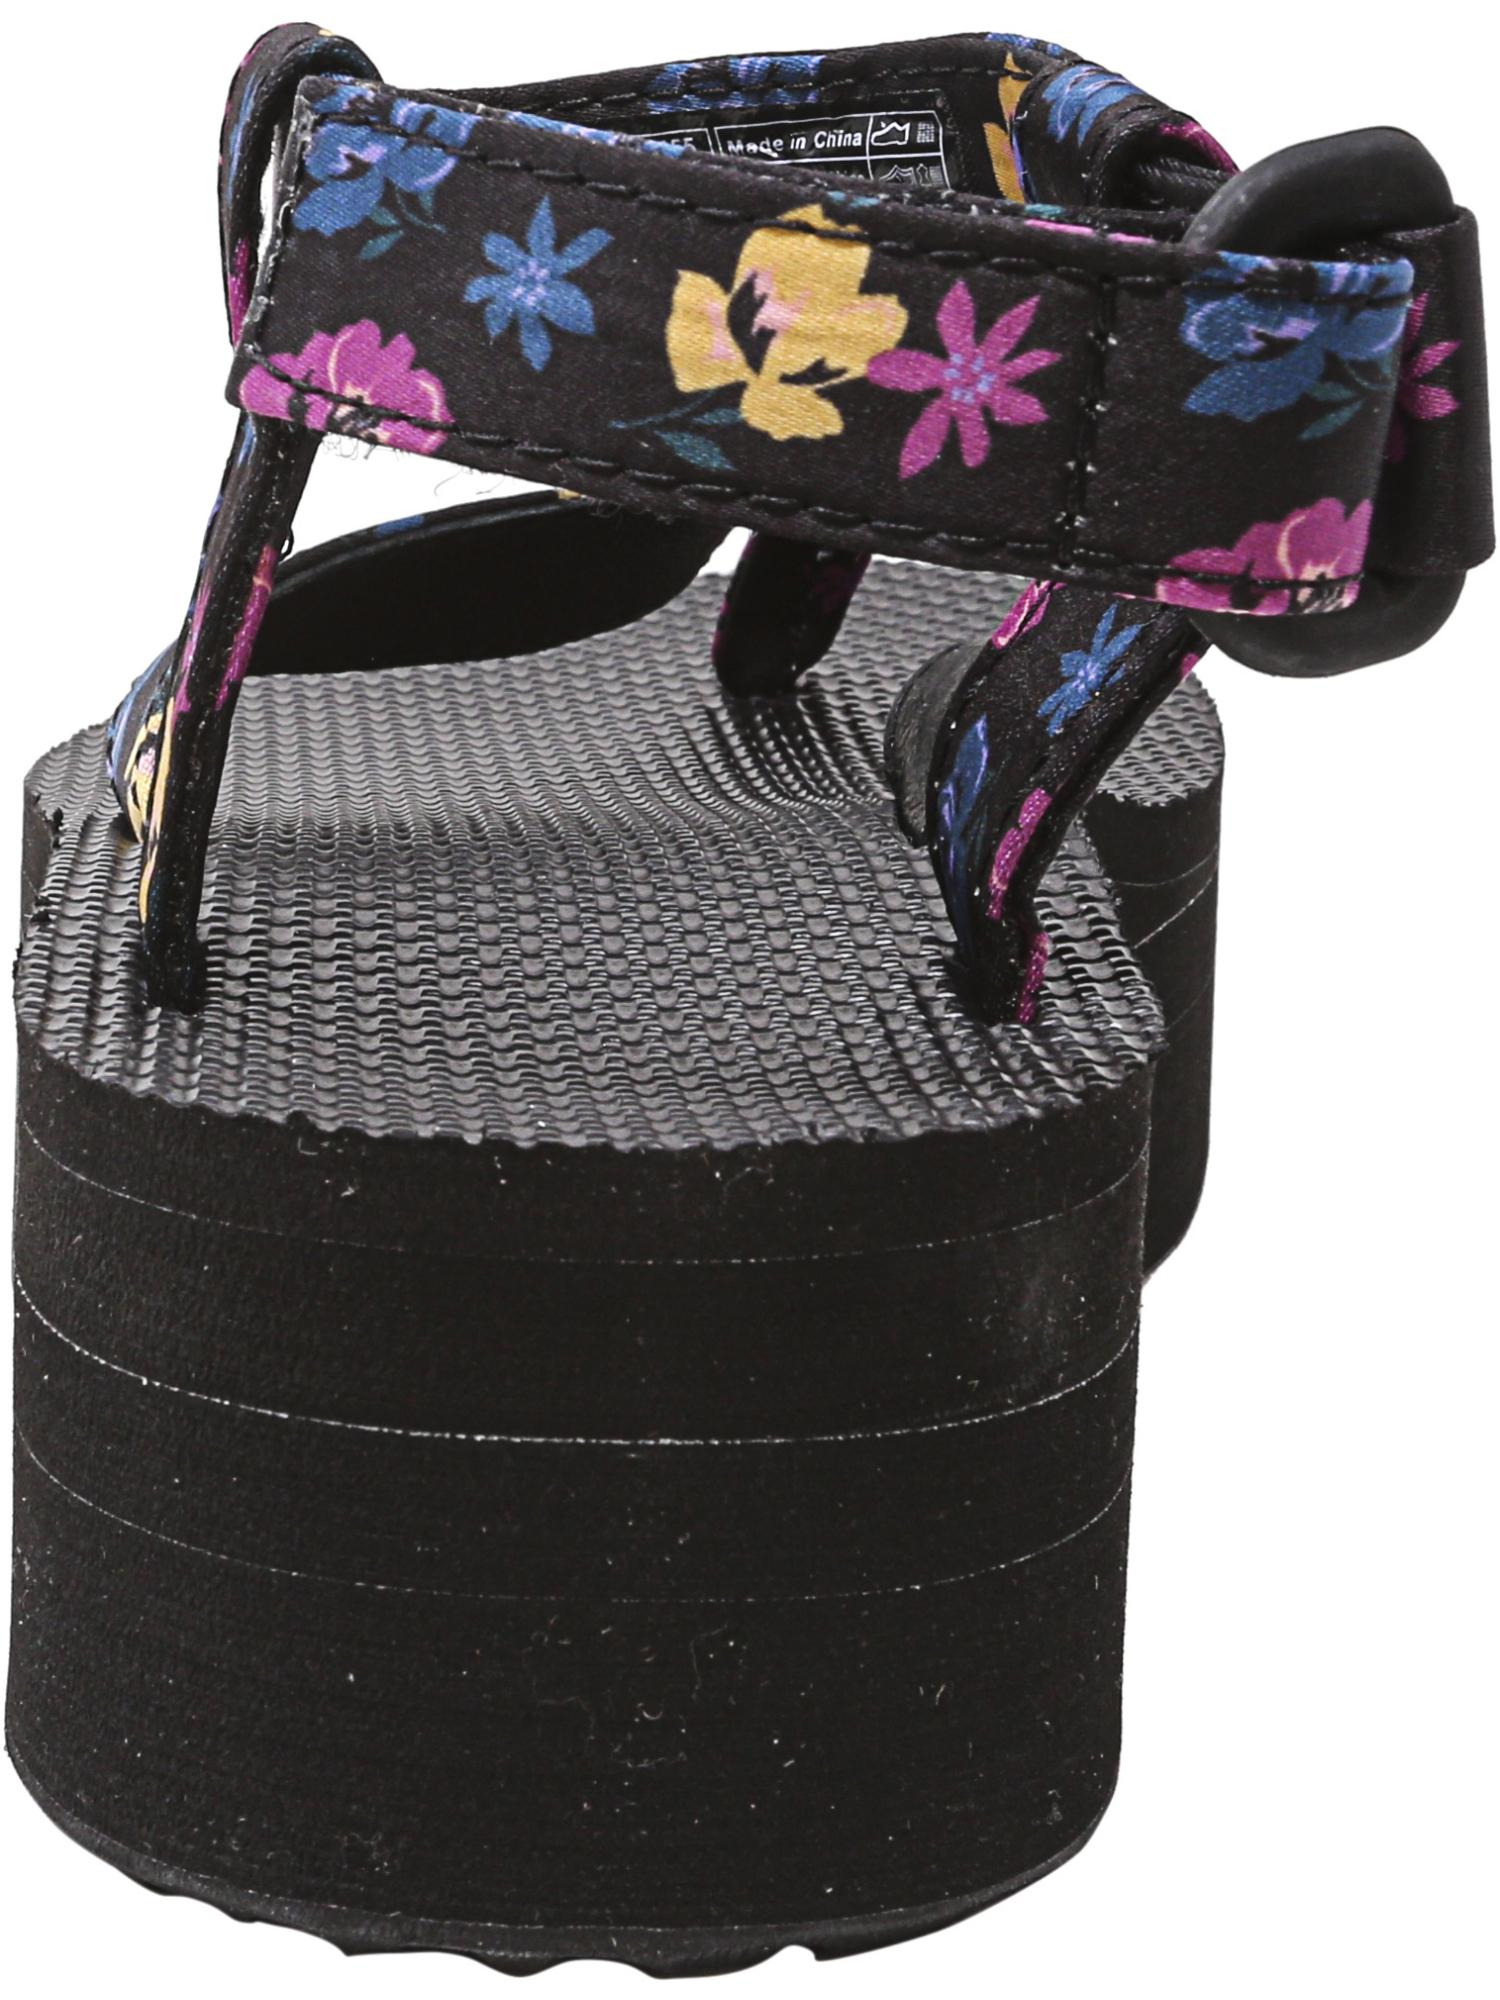 Teva-Women-039-s-Flatform-Sandal-Floral-Ankle-High thumbnail 7